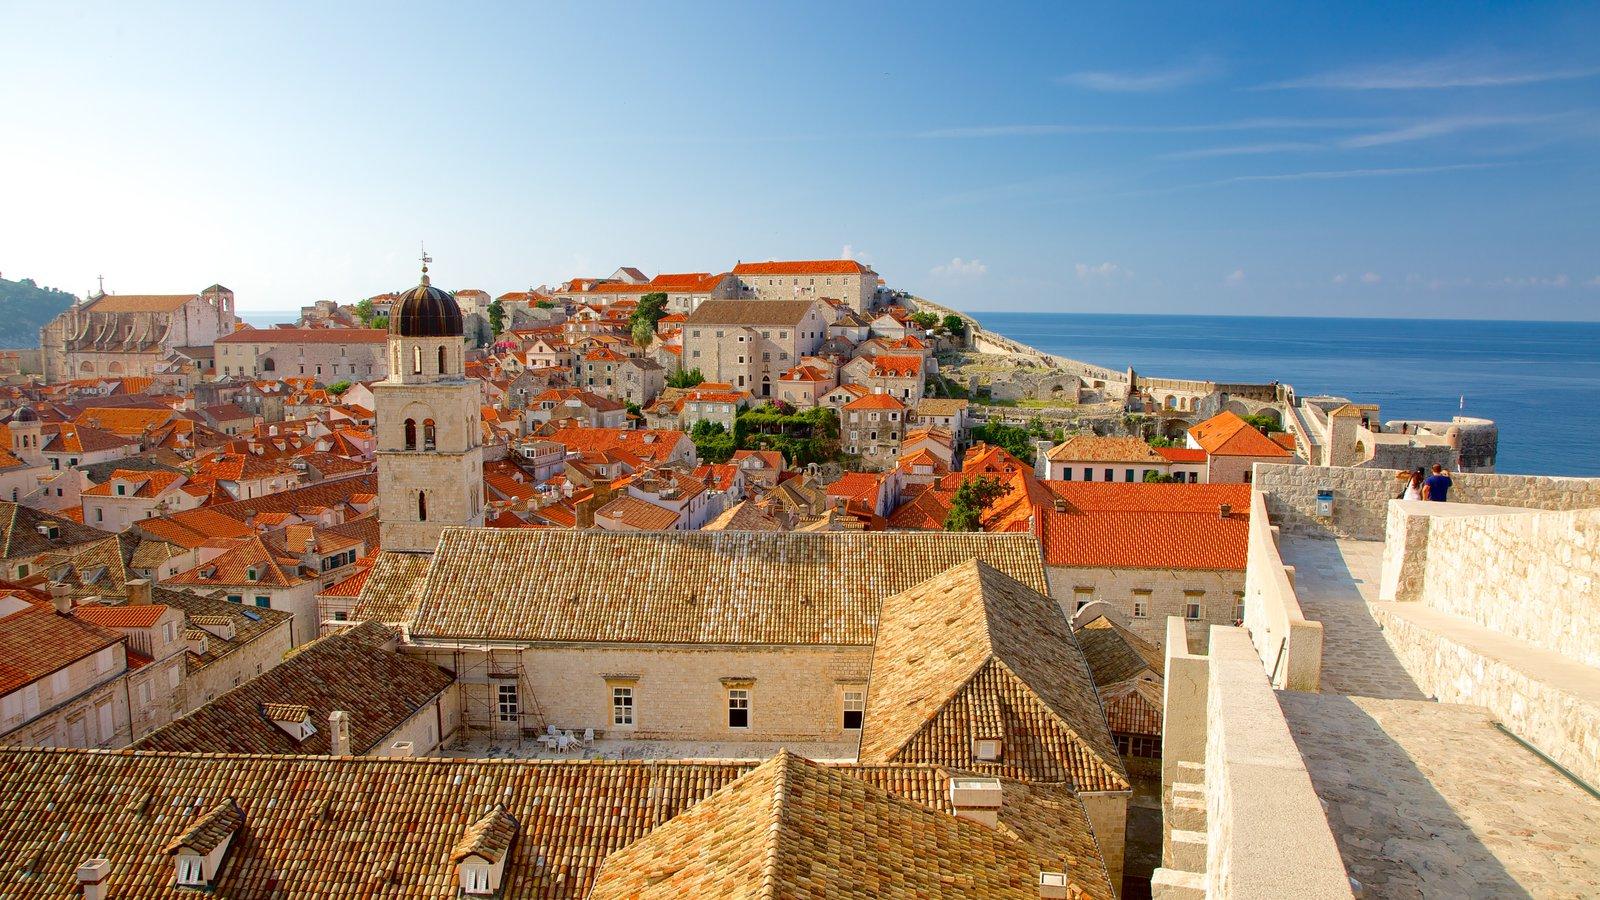 Croatia showing a coastal town and general coastal views